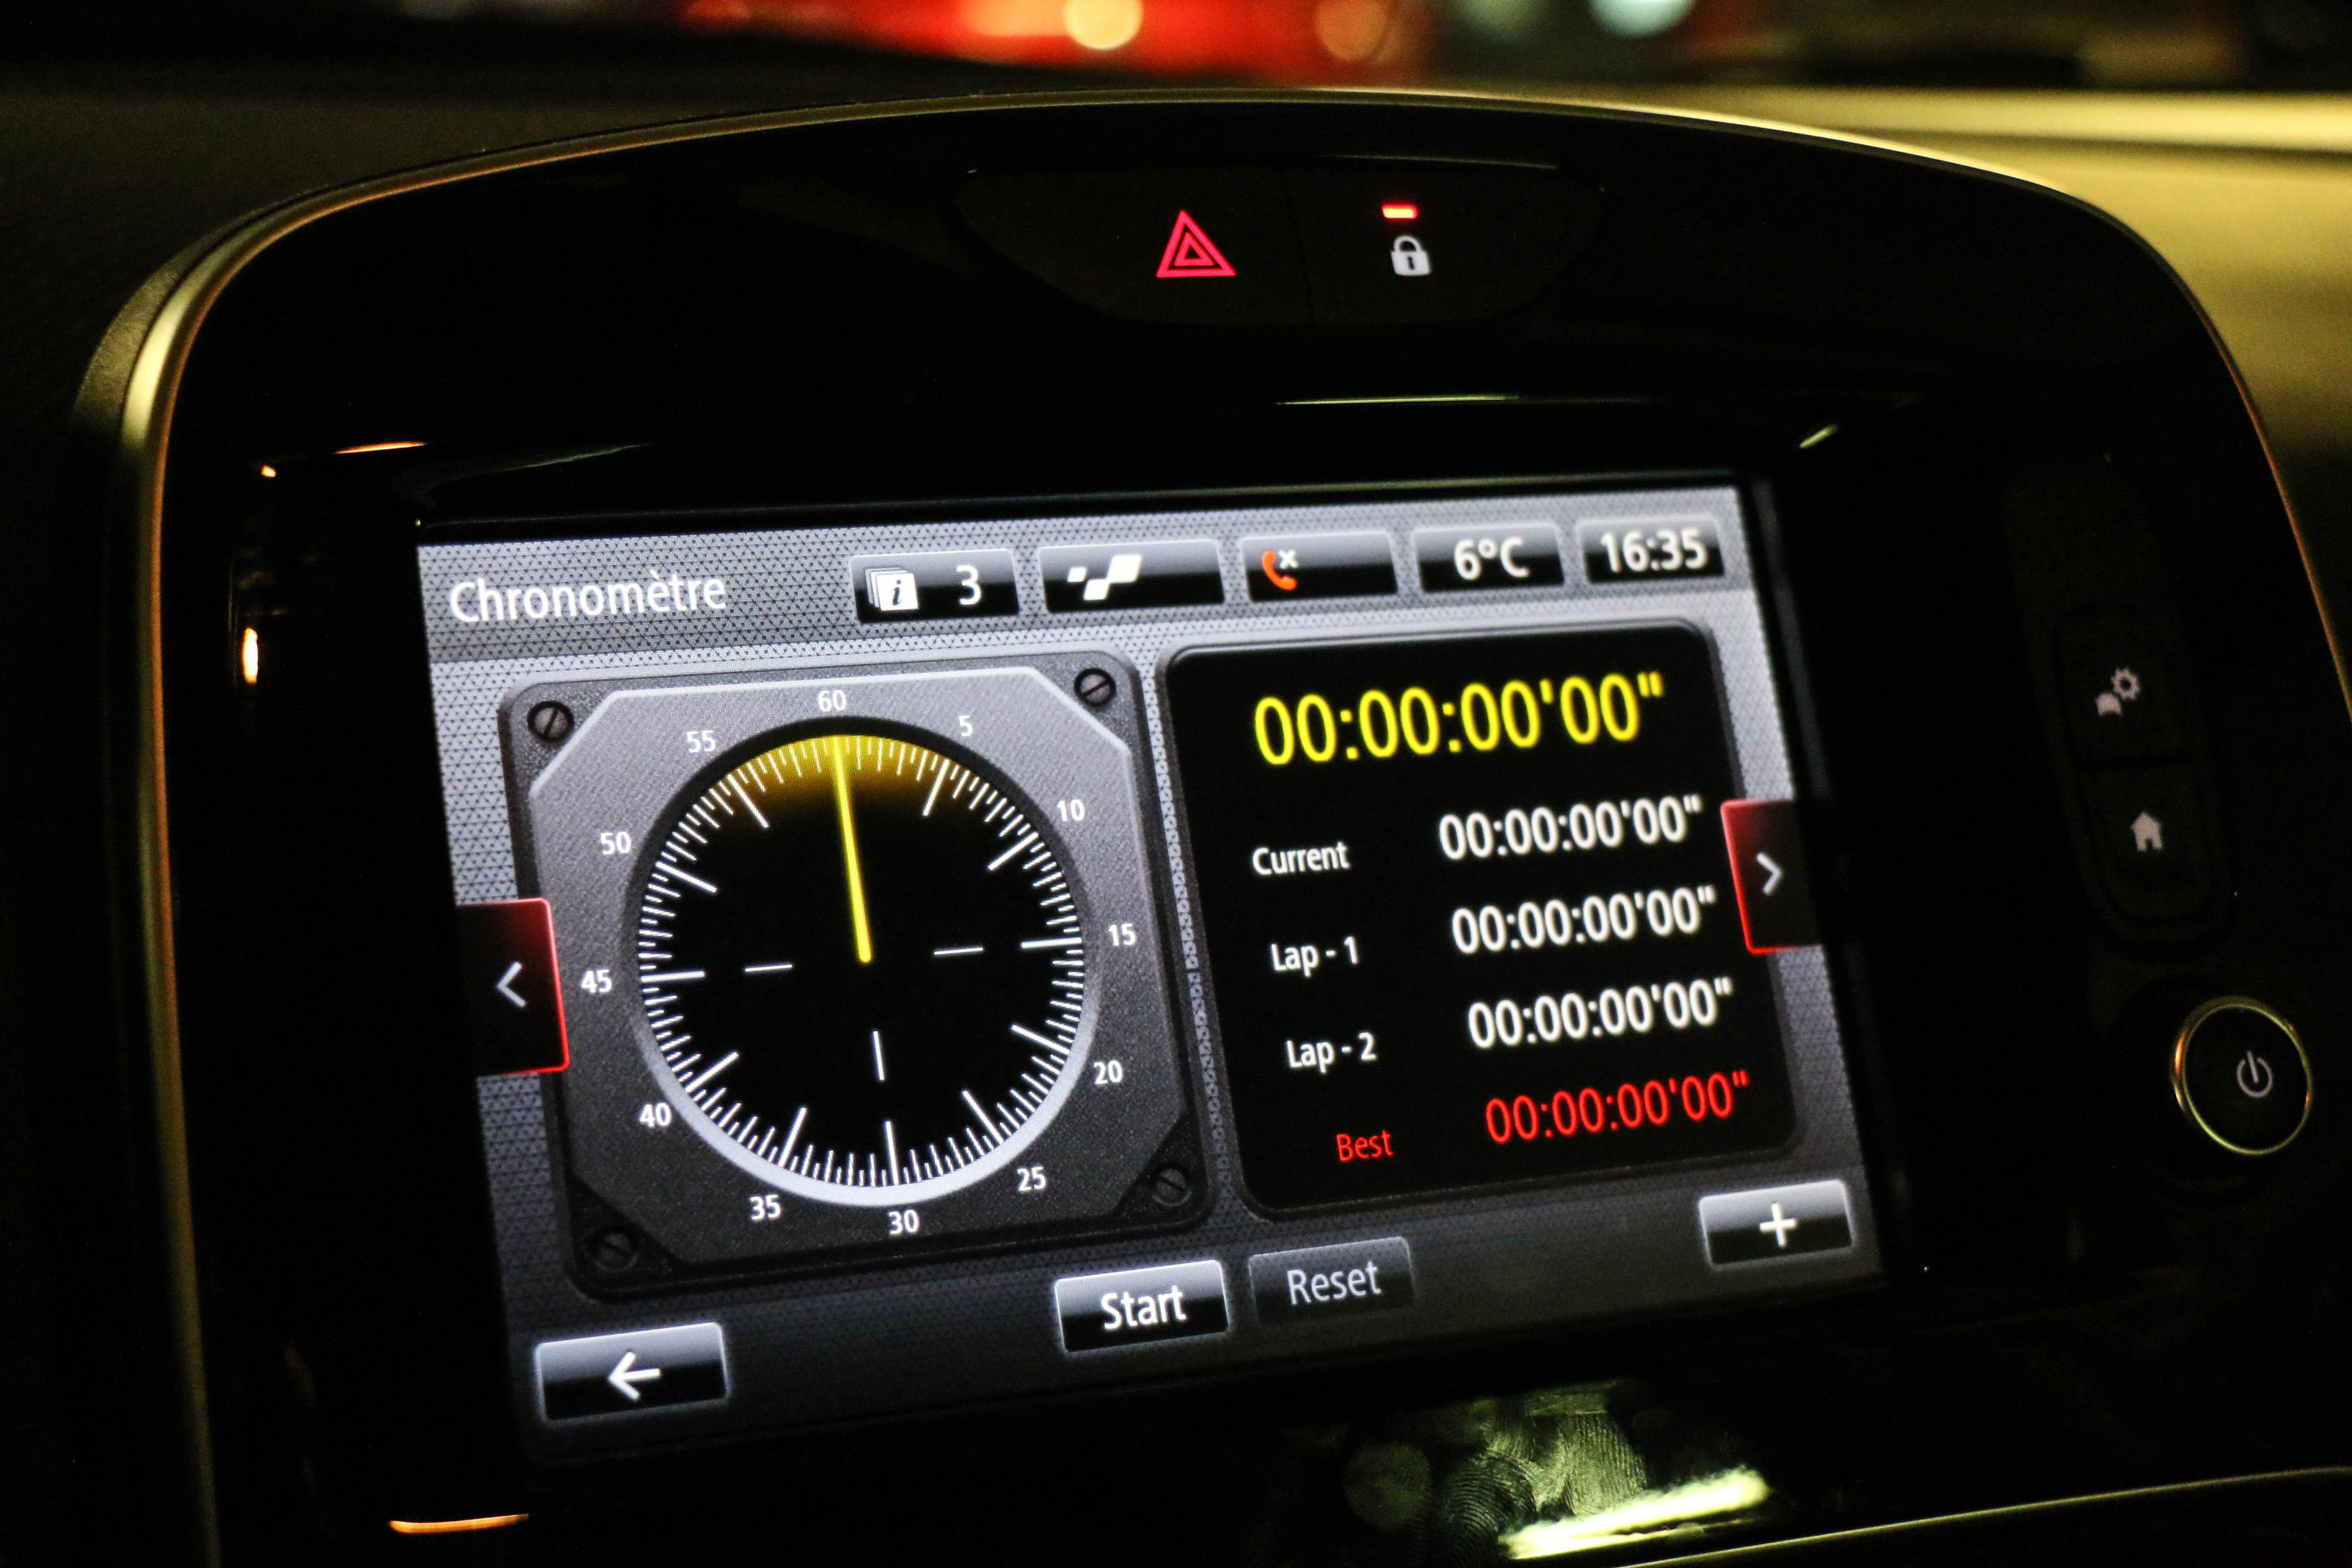 RenaultclioIVRSTrophy57-renault-clio-RS-trophy-intérieur-onboard-Arnaud Demasier-RSPhotographie